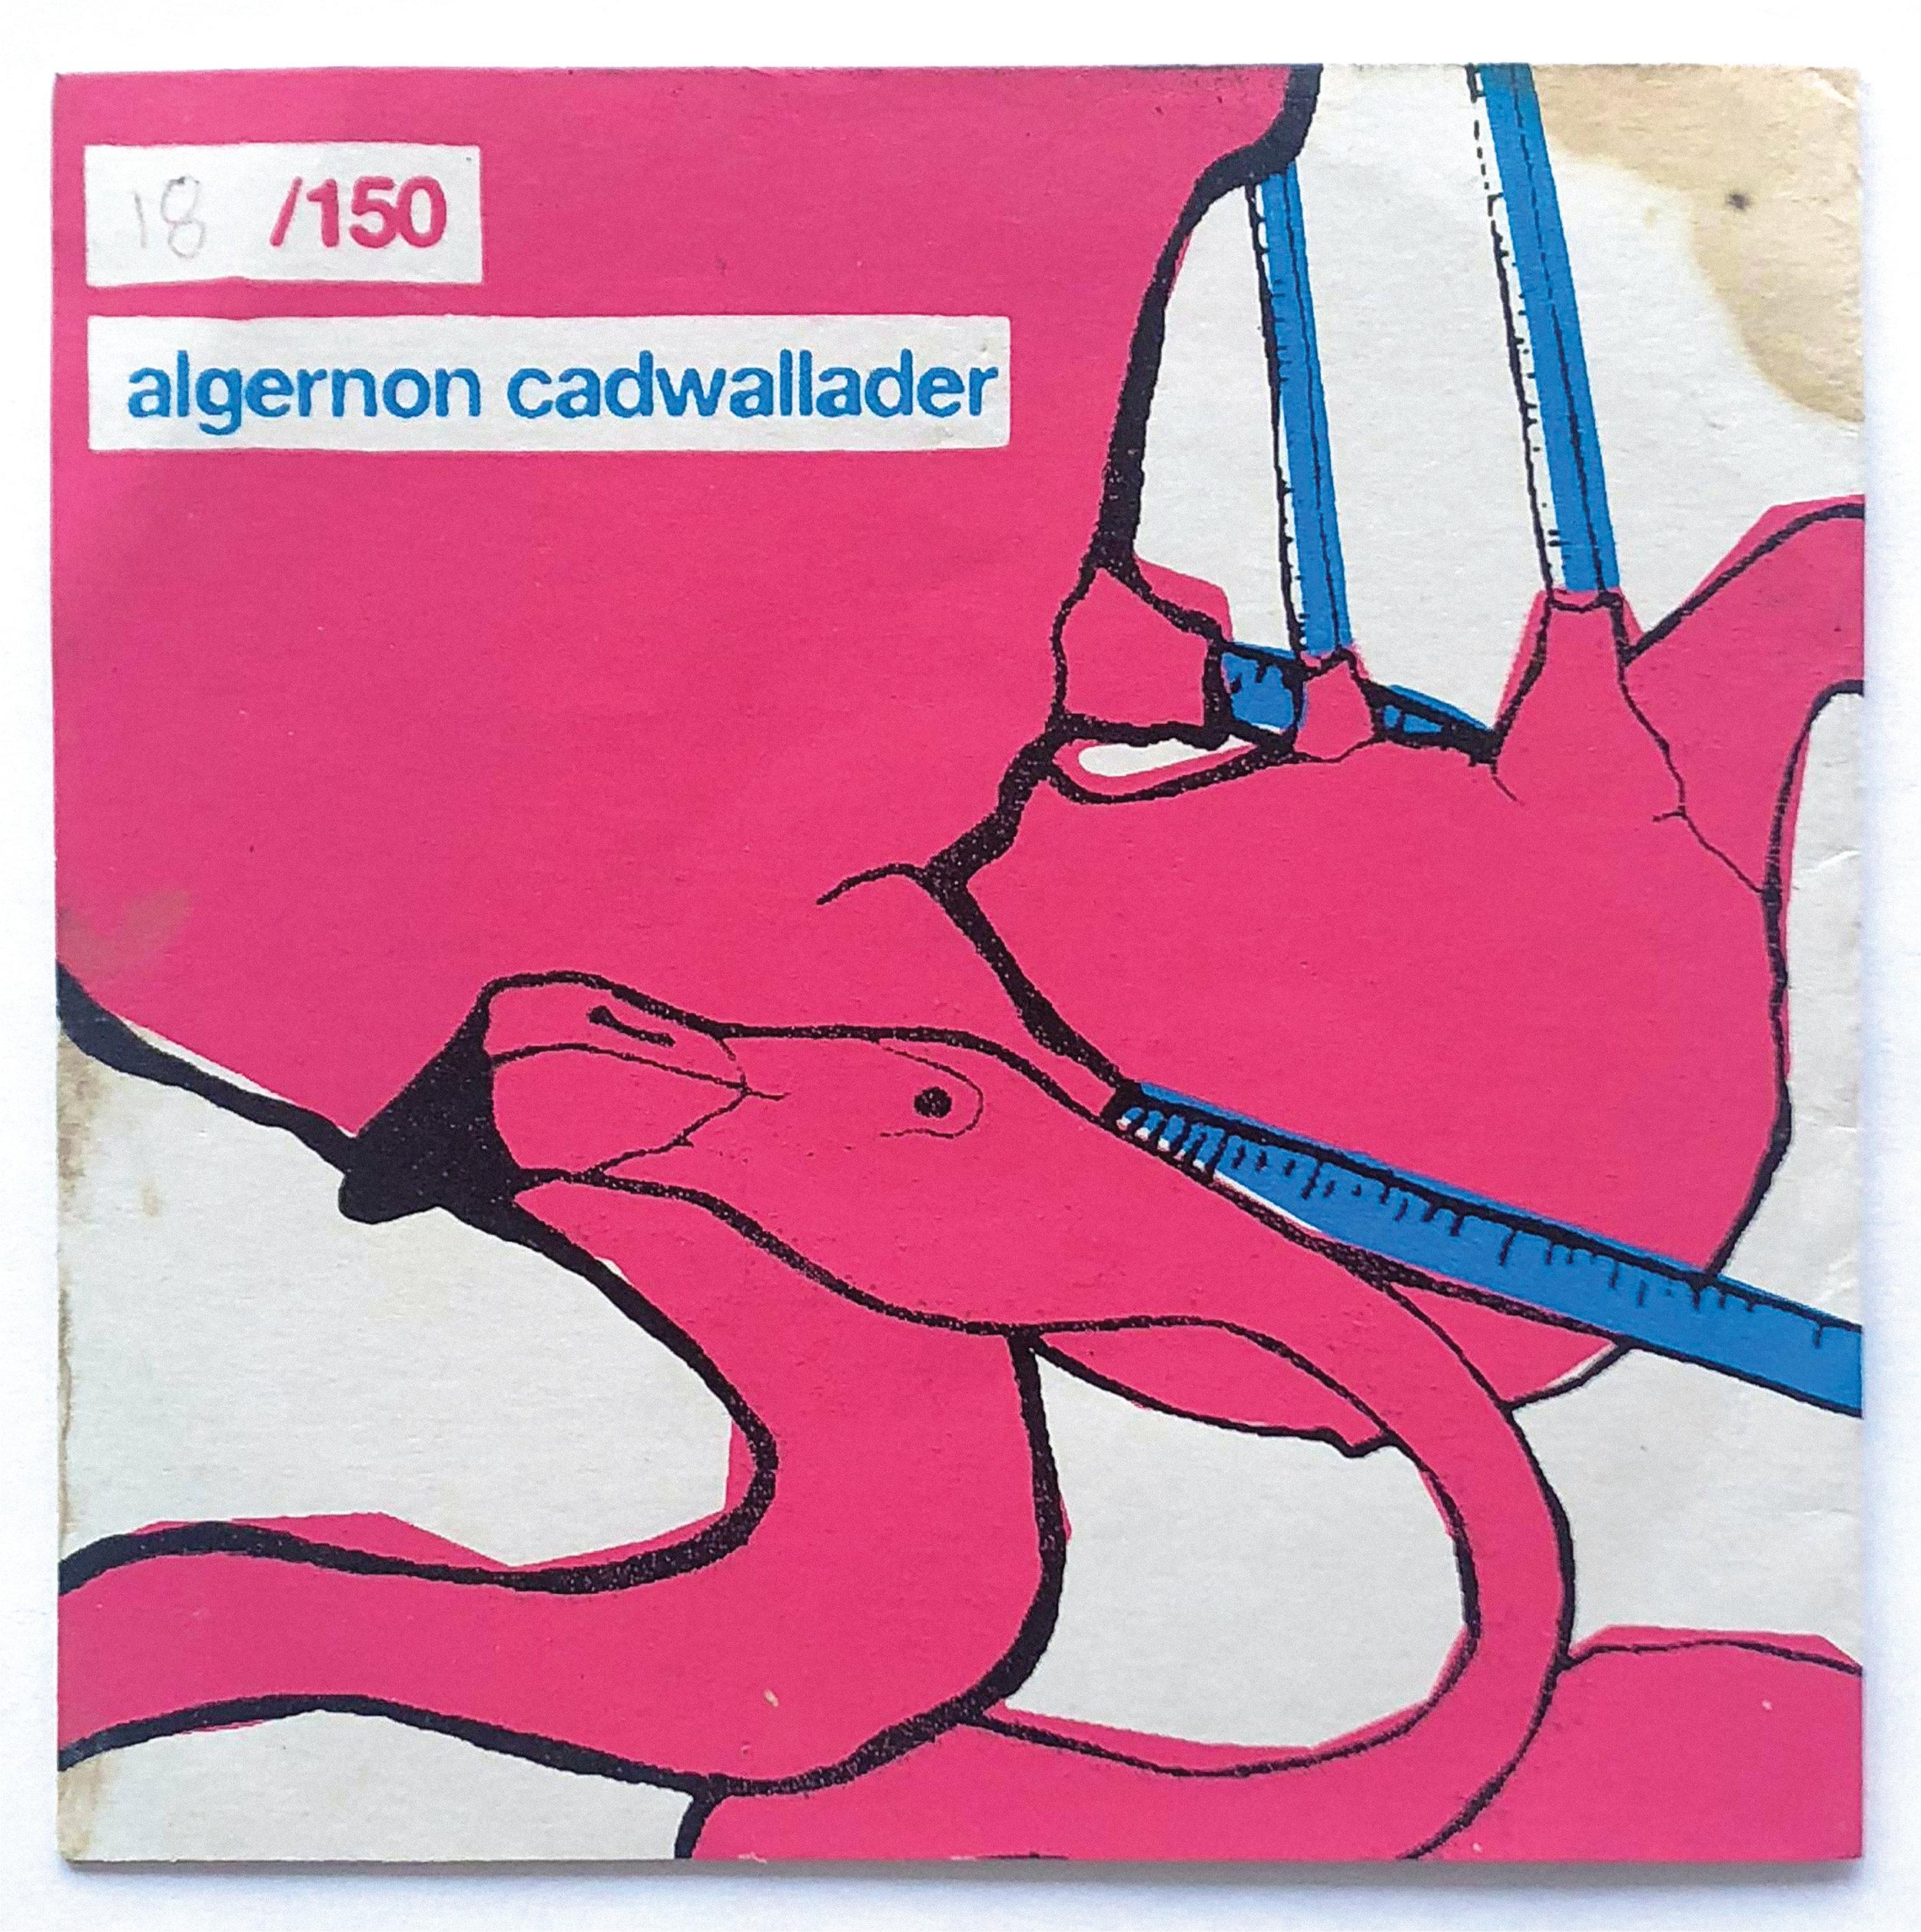 Algernon Cadwallader - Algernon Cadwallader